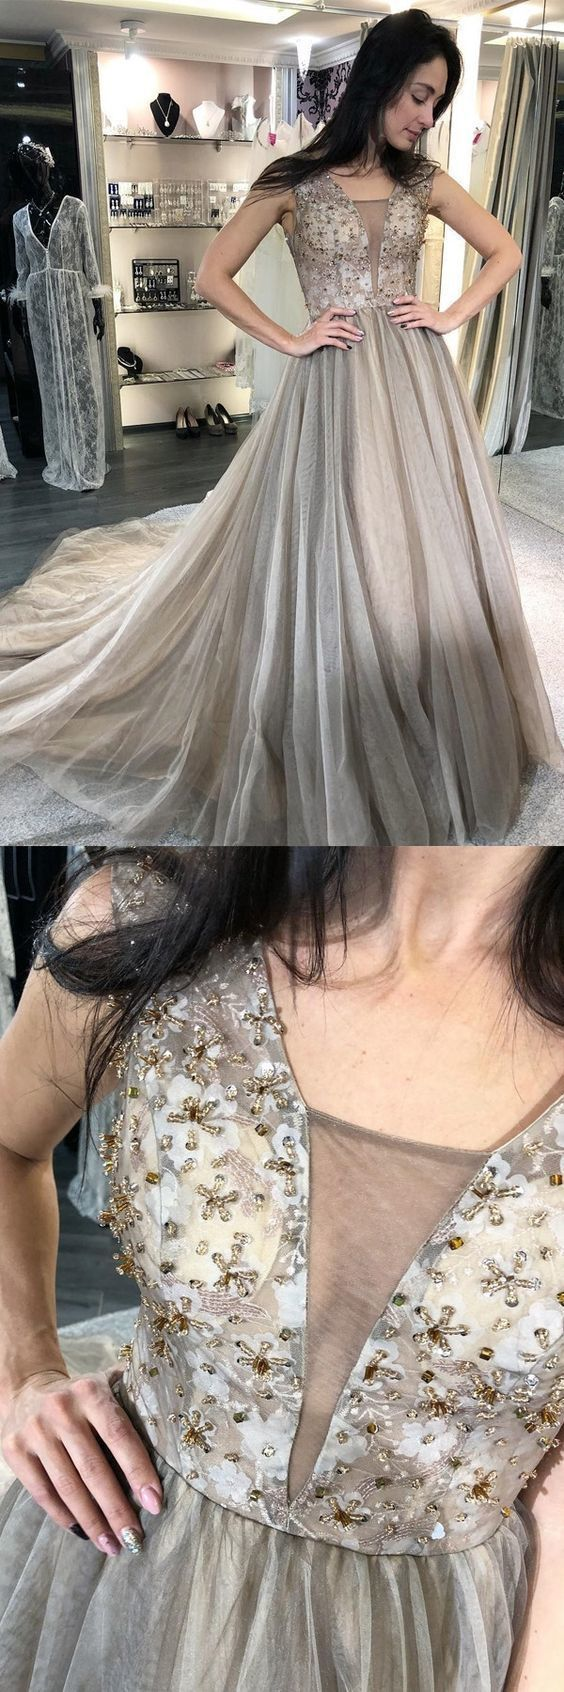 Beautiful Elegant A-Line V-Neck Sweep Train Light Grey Prom Dress with Beading